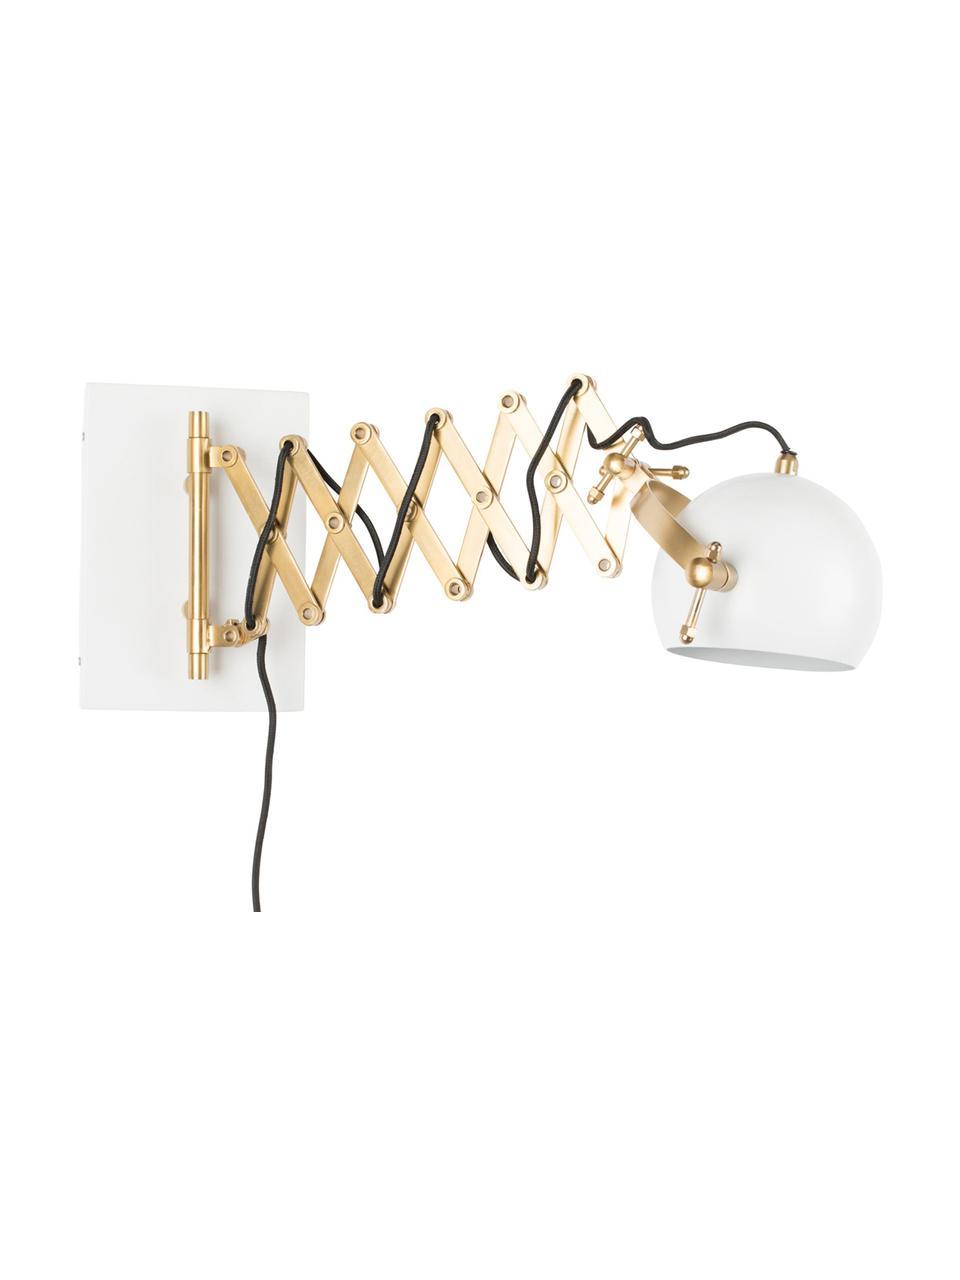 Wandleuchte Sarana mit Stecker, Lampenschirm: Metall, pulverbeschichtet, Gestell: Metall, Messingfarben, Weiß, B 17 x T 36 bis 64 cm